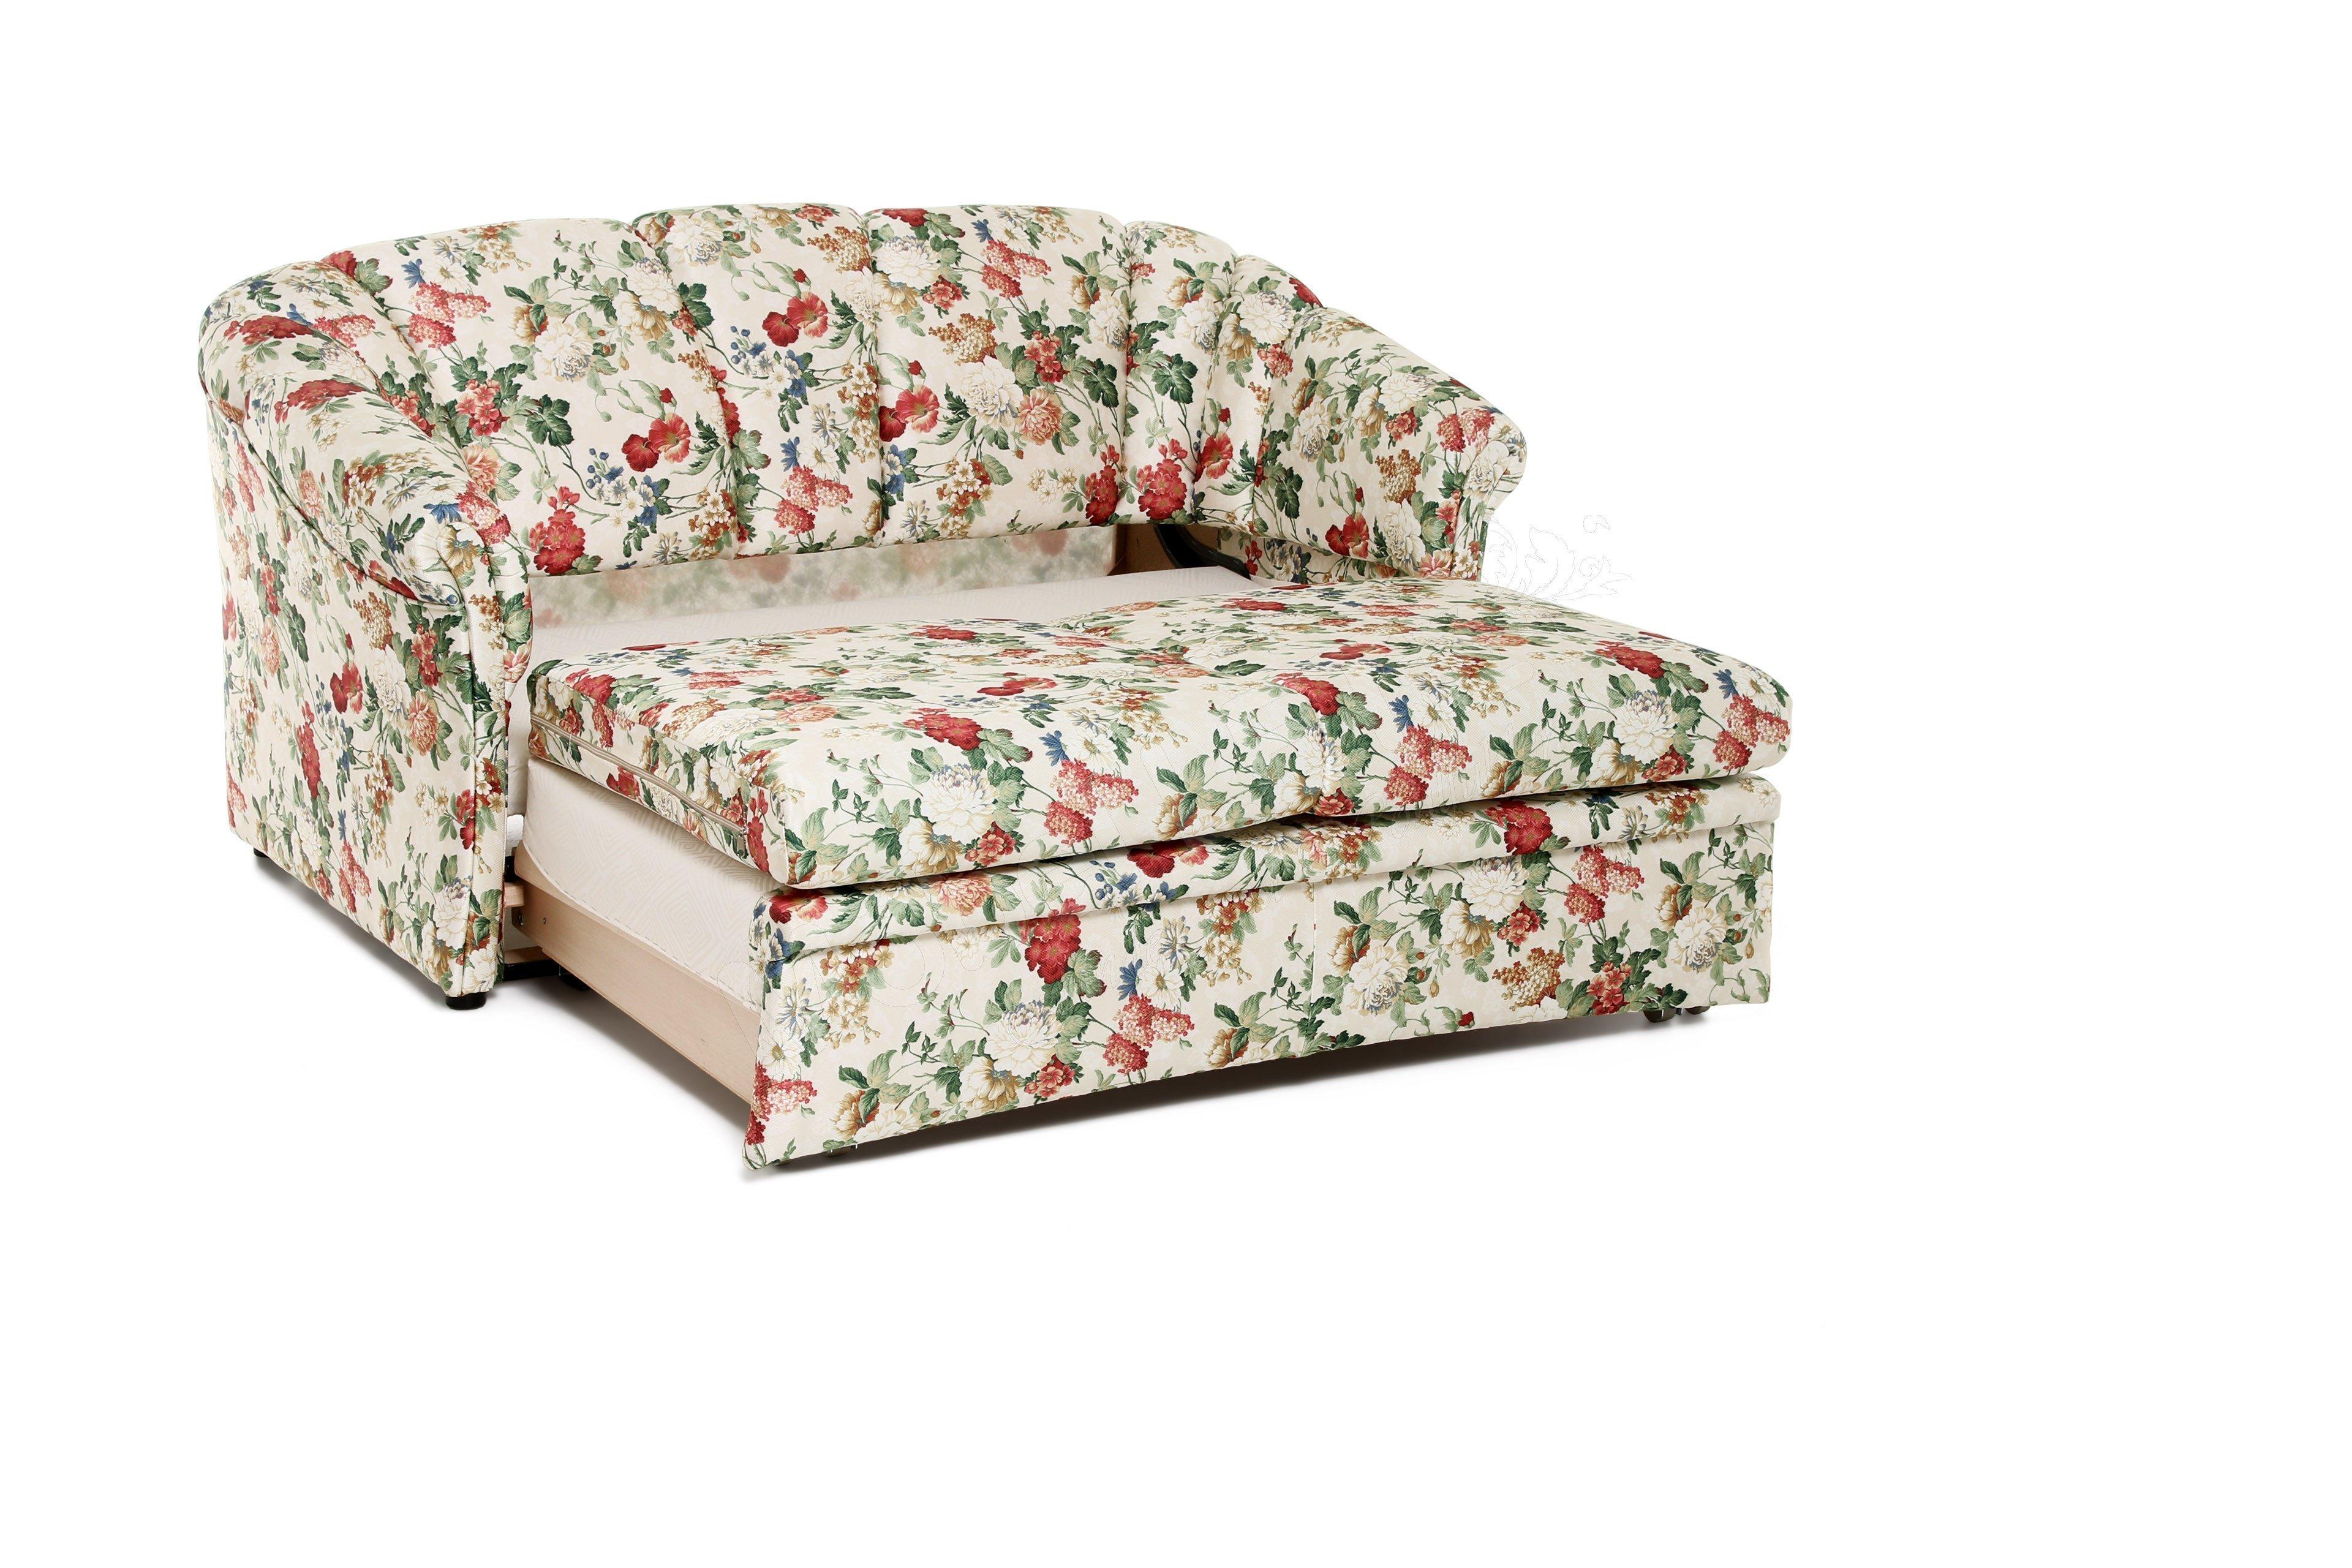 restyl schlafsofa anke mit bezauberndem blumenmuster l. Black Bedroom Furniture Sets. Home Design Ideas